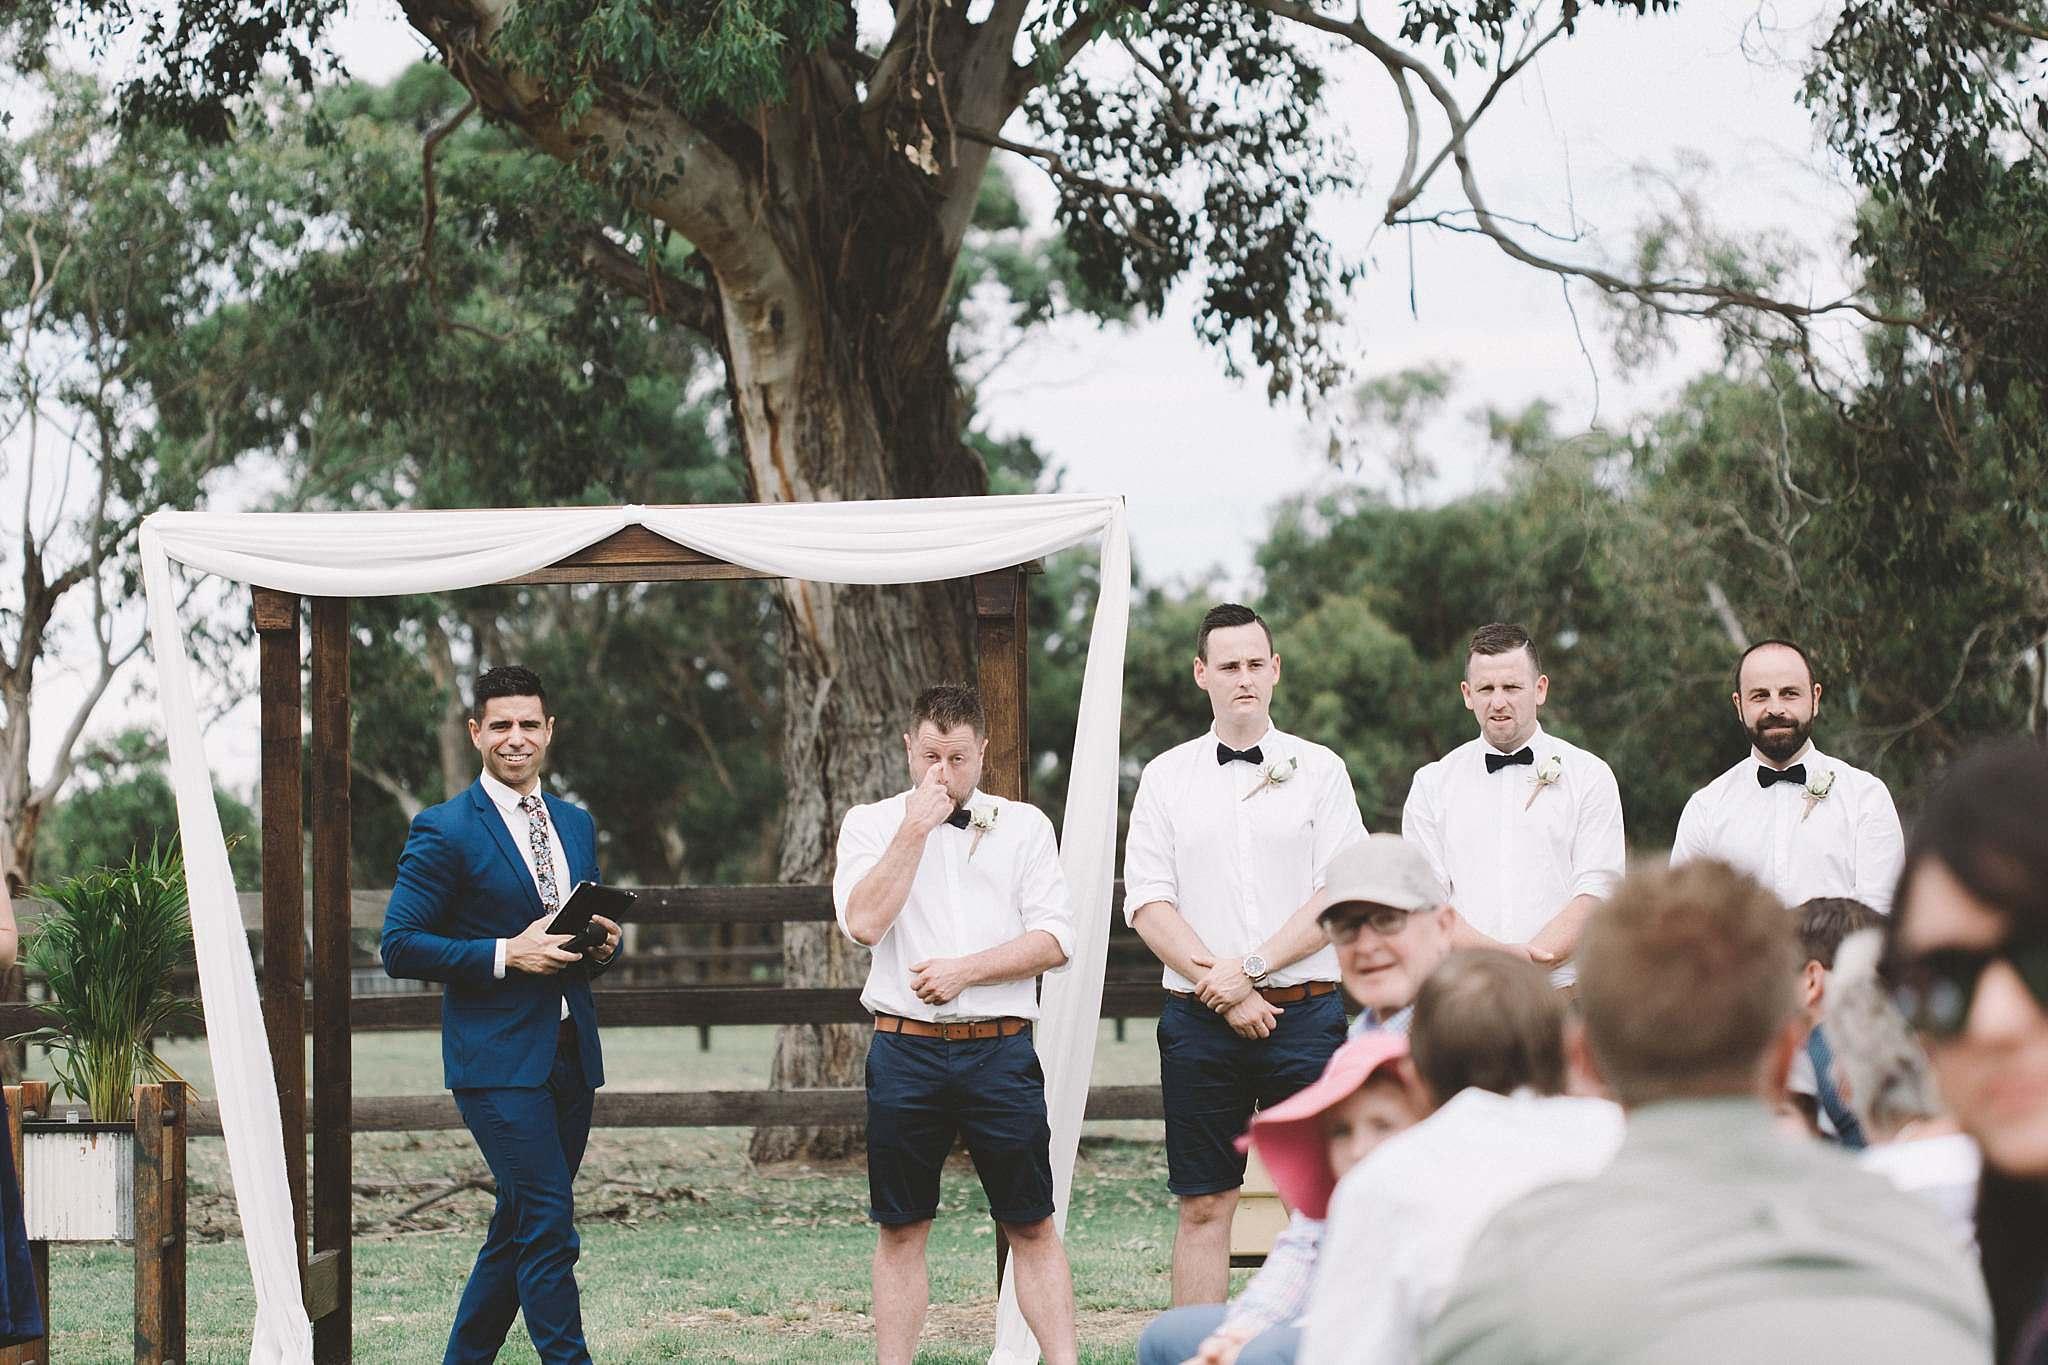 Mornington Peninsula Wedding Photographer 78.JPG